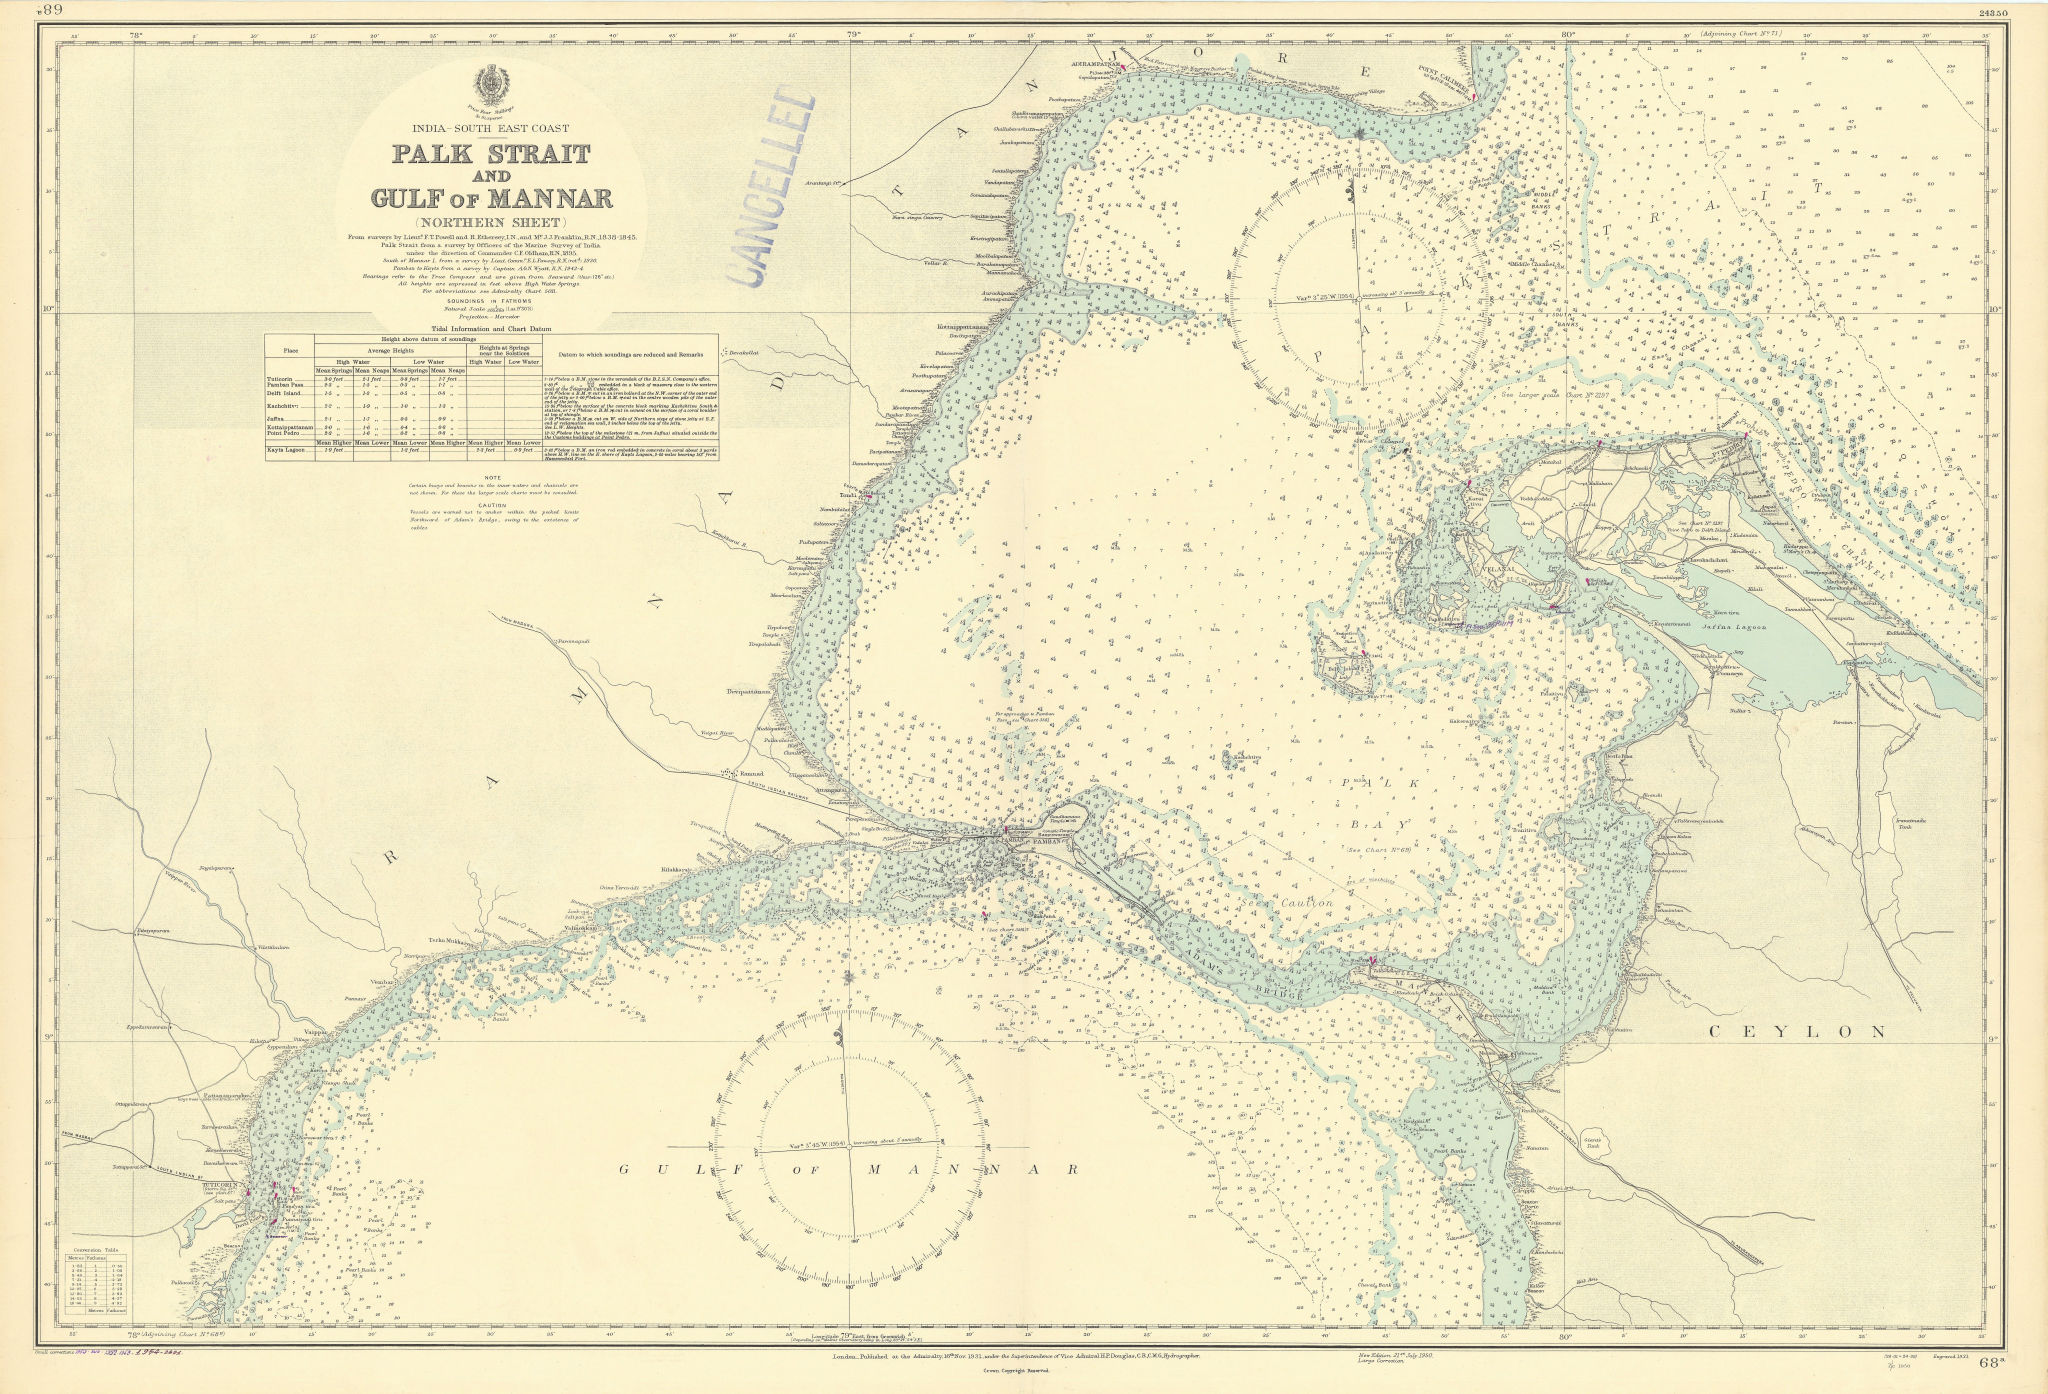 Palk Strait Mannar Gulf Adam's Bridge Sri Lanka ADMIRALTY chart 1931 (1954) map